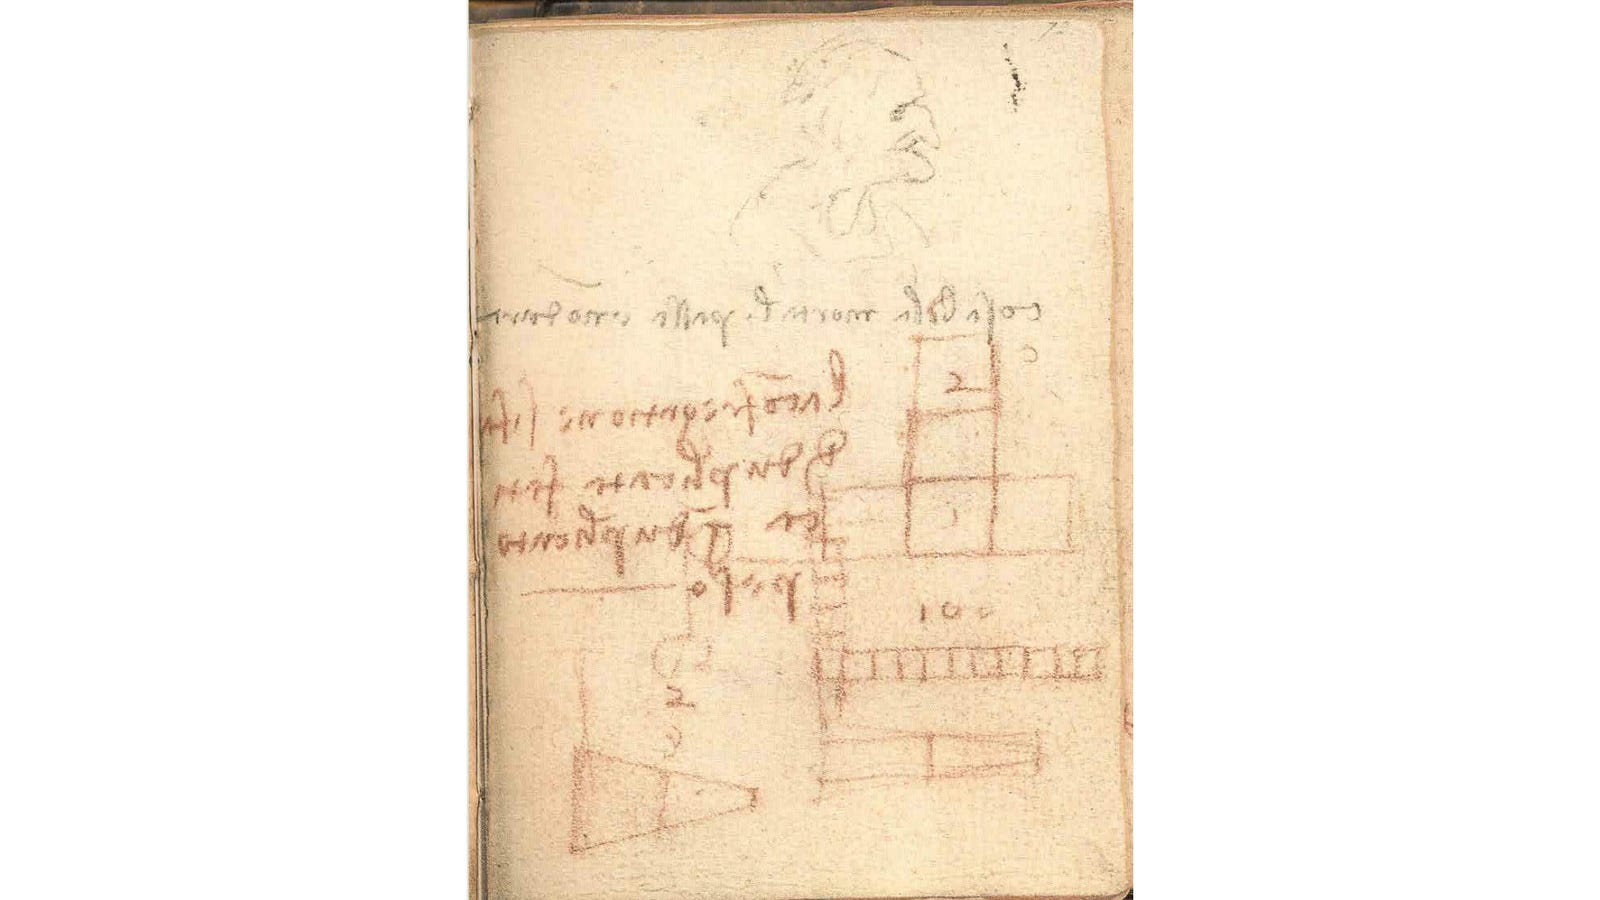 resume Leonardo Da Vinci Resume engineer discovers something amazing in da vincis irrelevant scribbles